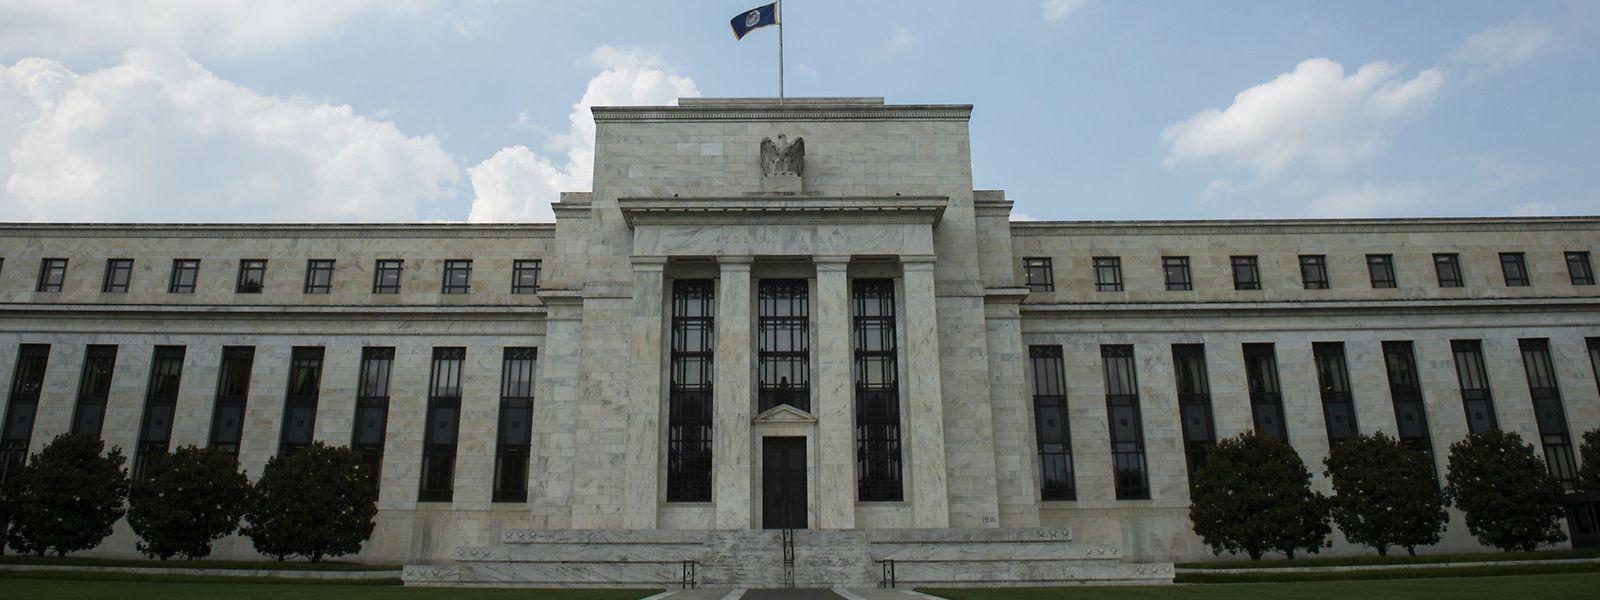 Die US Federal Reserve  in Washington, DC.